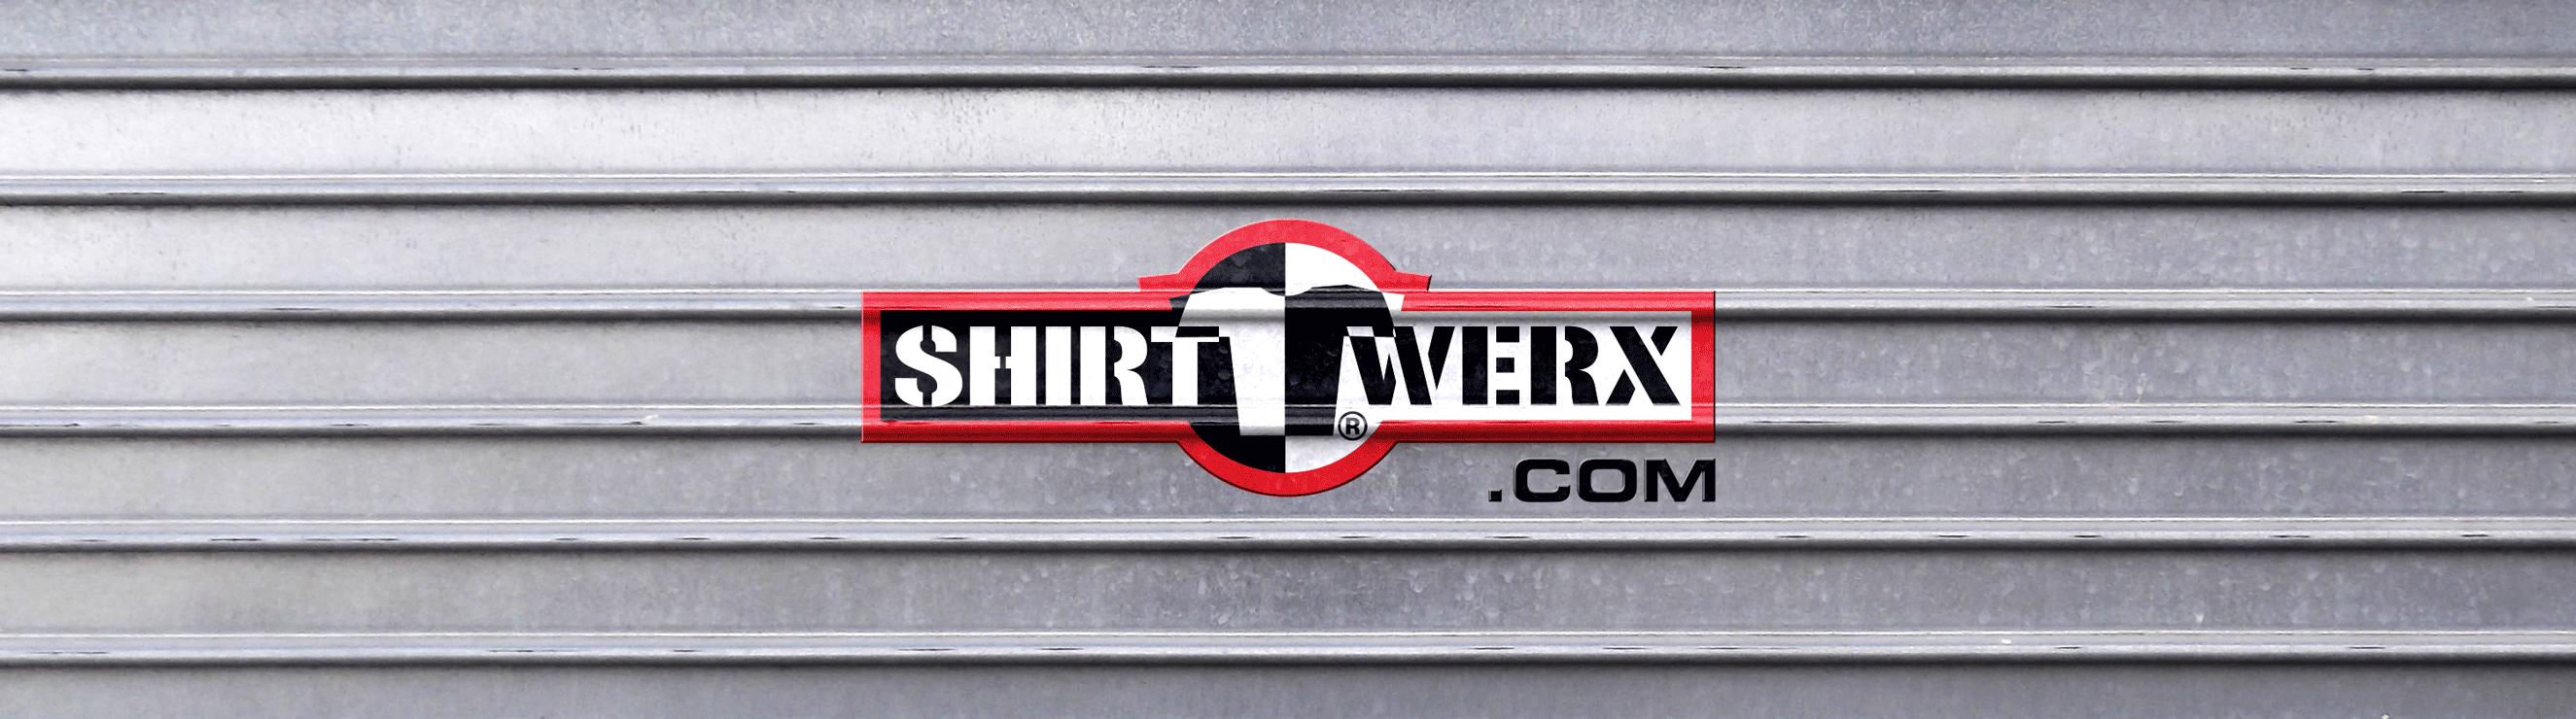 Shirtwerx-Slider-Garage-Door